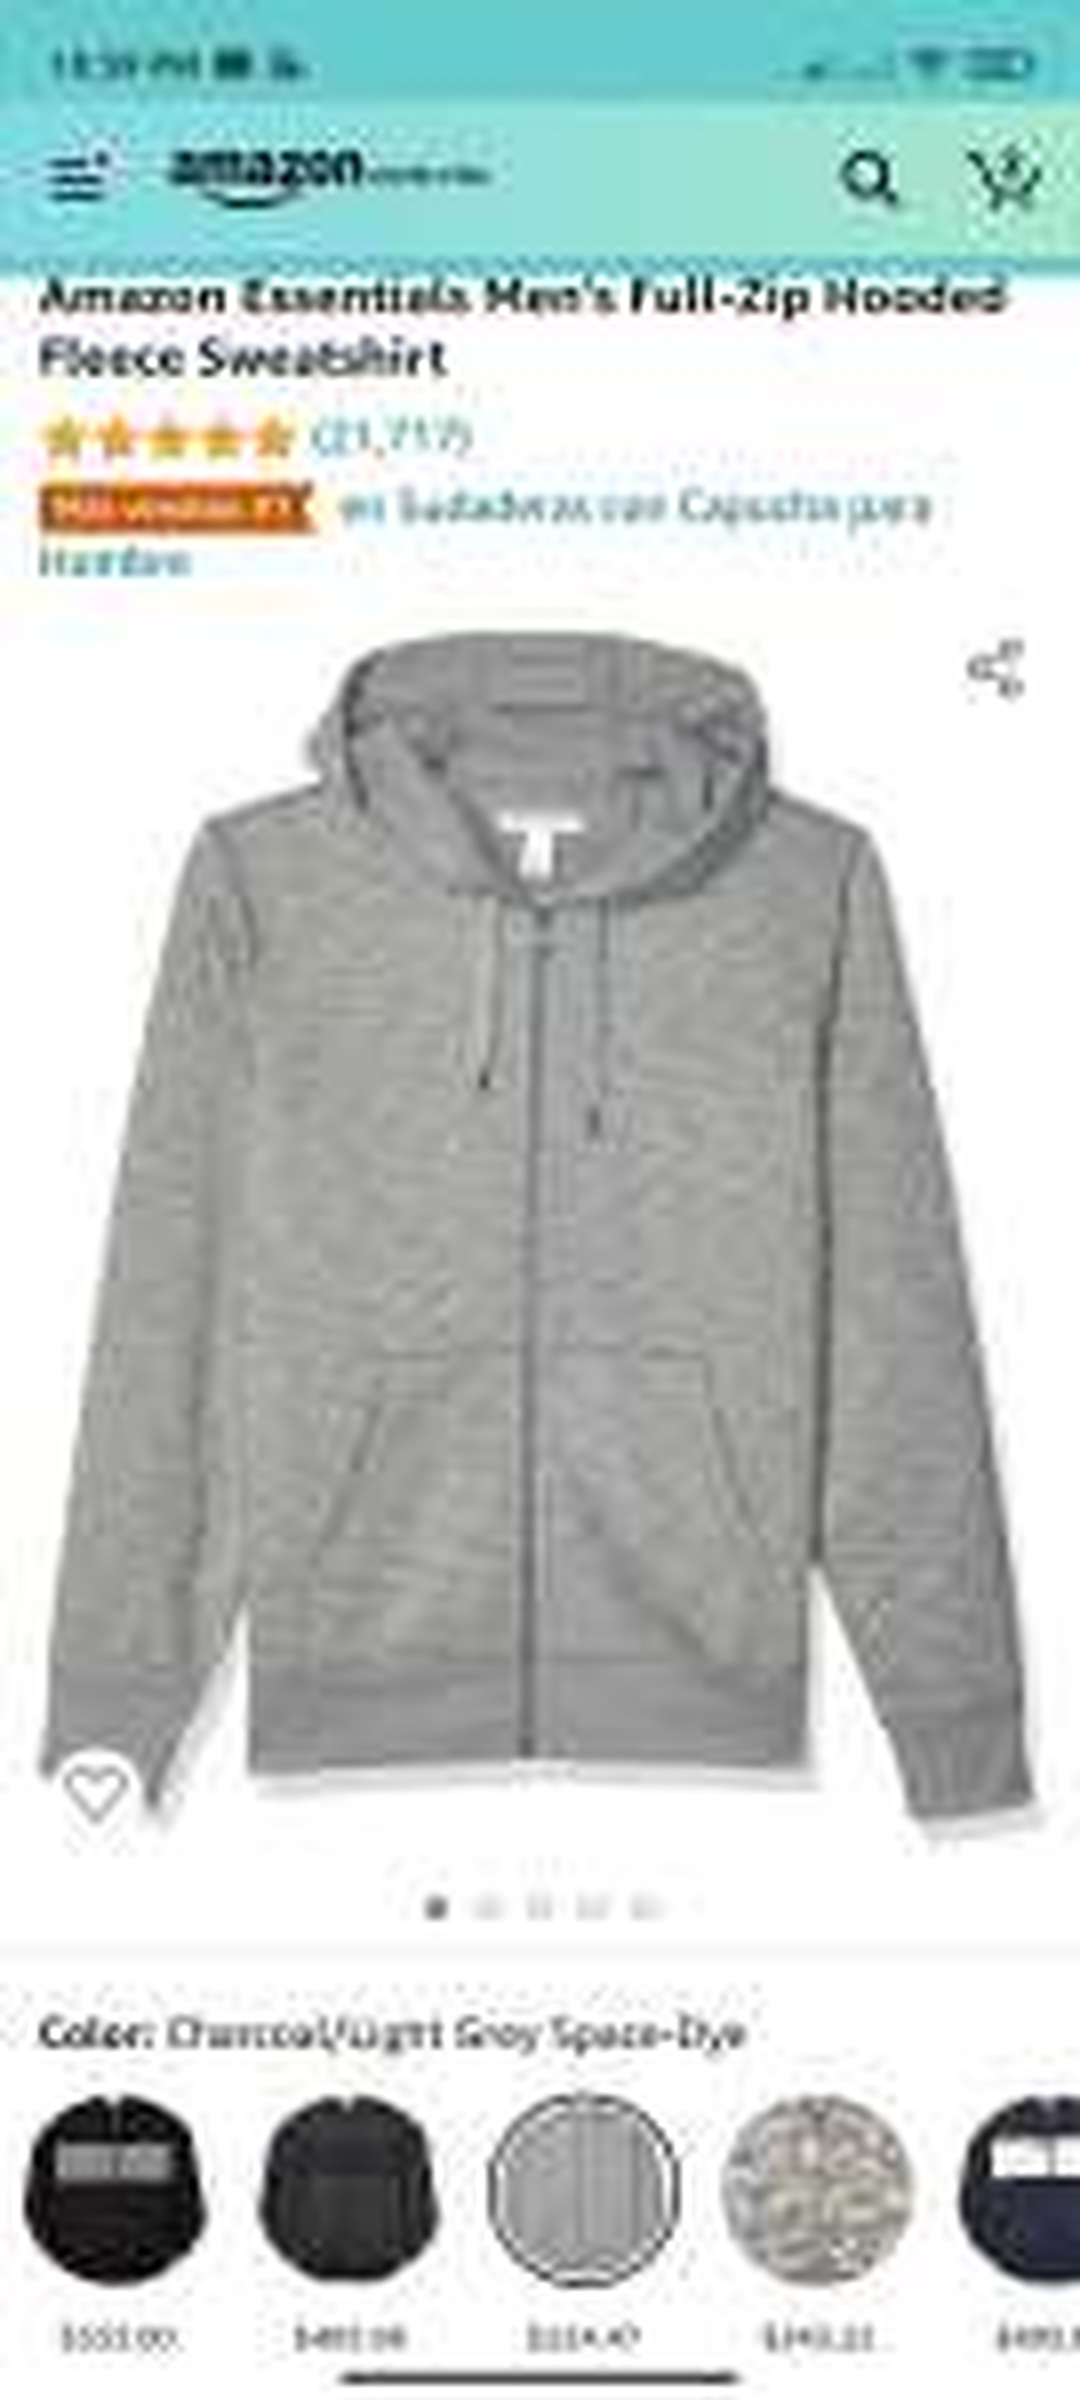 Amazon Essentials Men's Full-Zip Hooded Fleece Sweatshirt - Sudadera con capucha para hombre - Talla XS